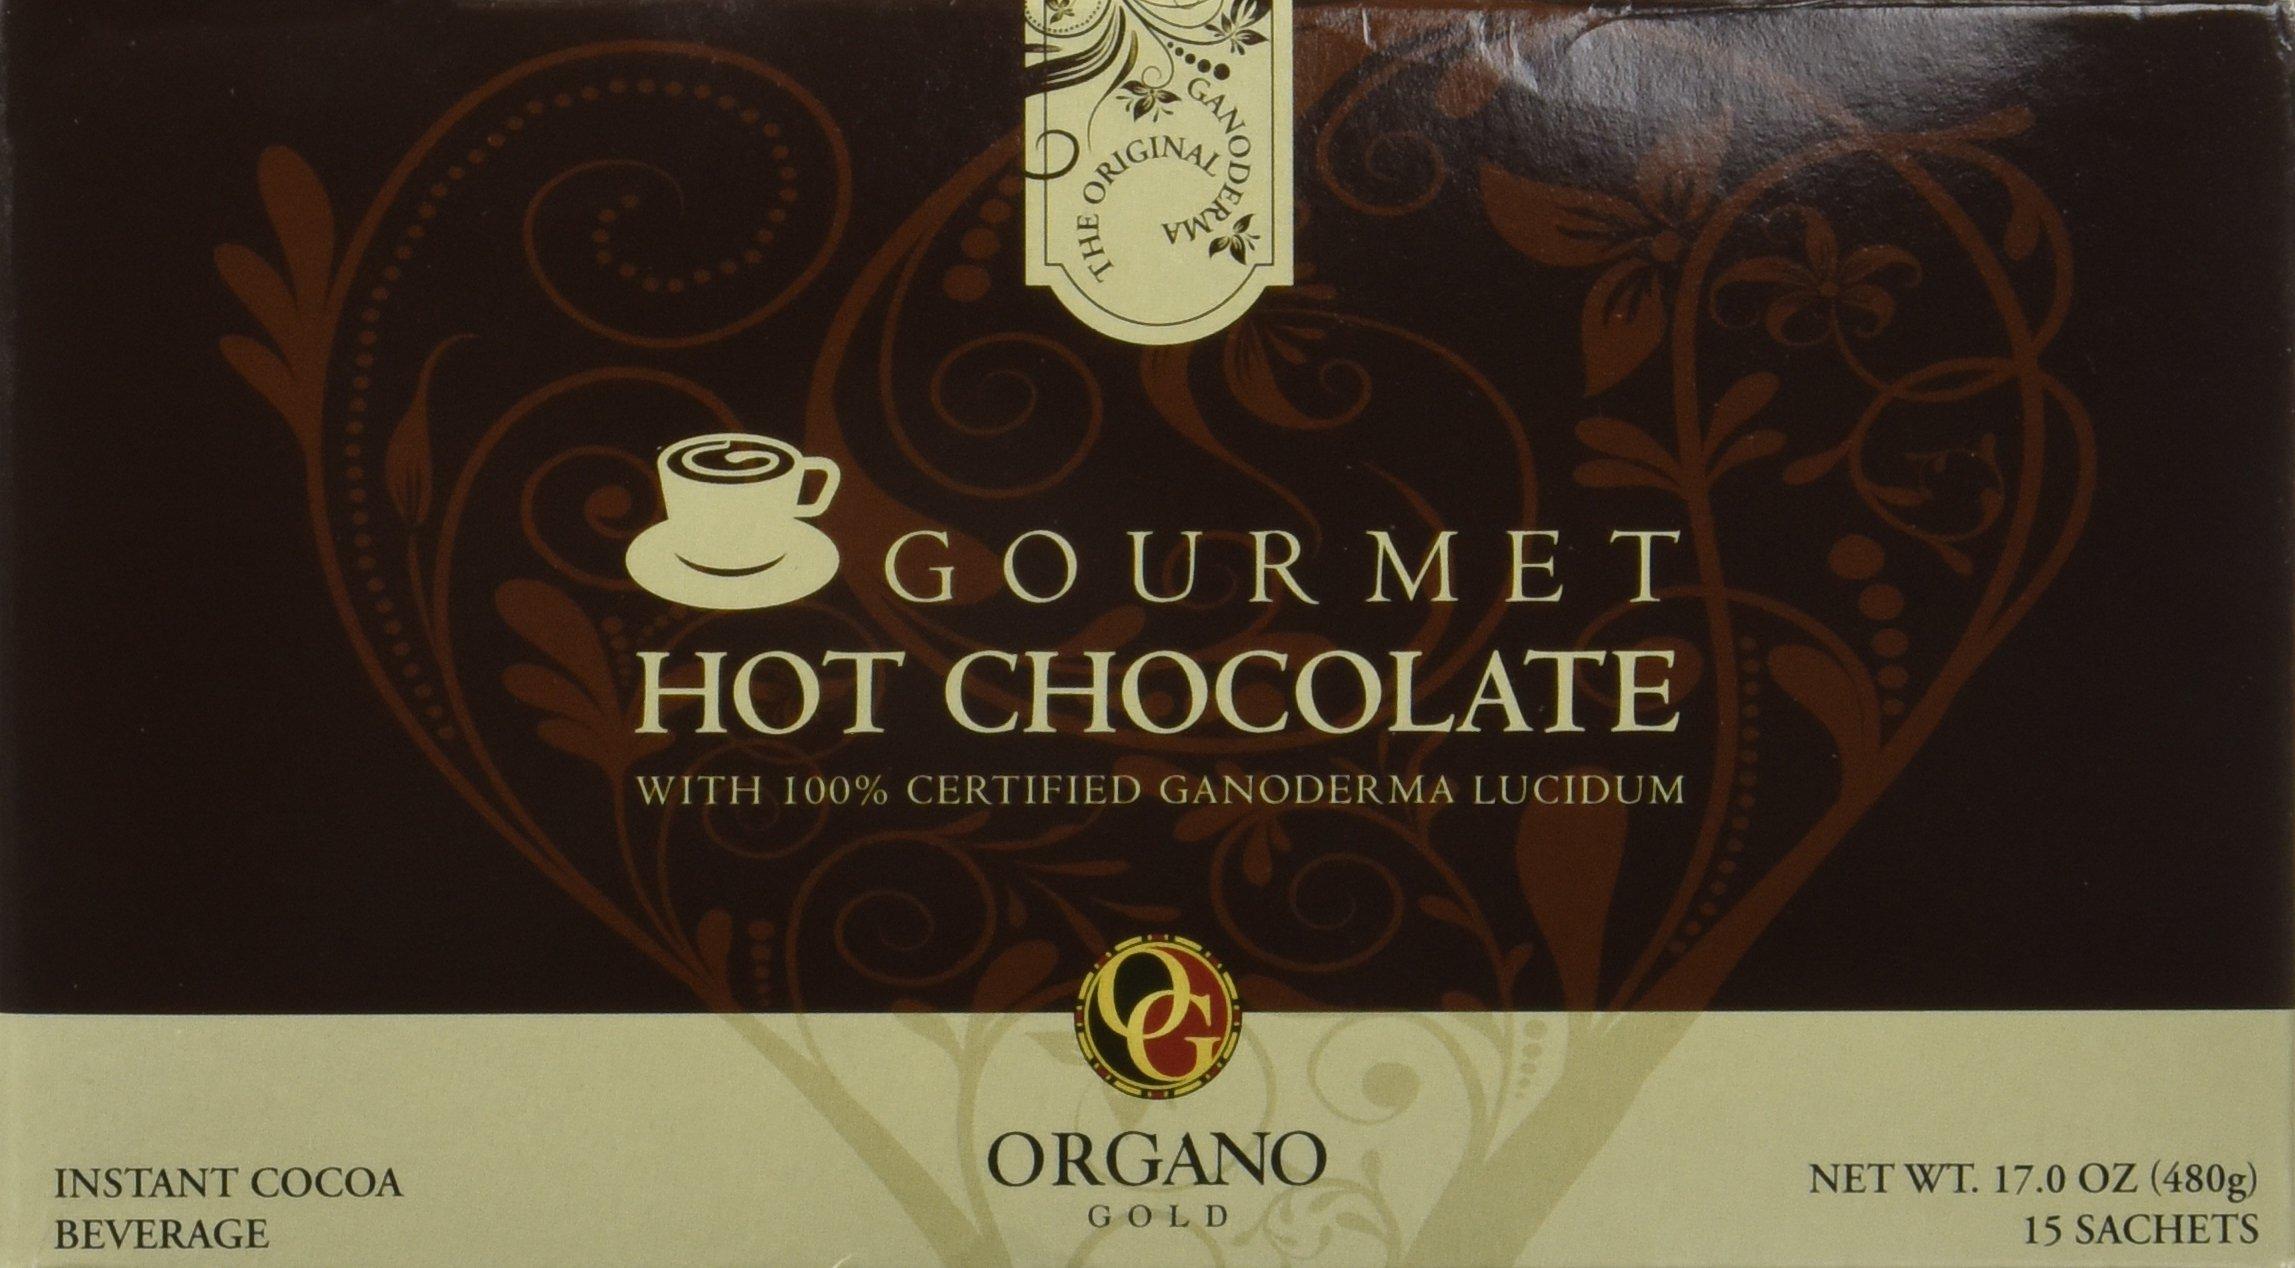 organo gold black iced tea energy drink health